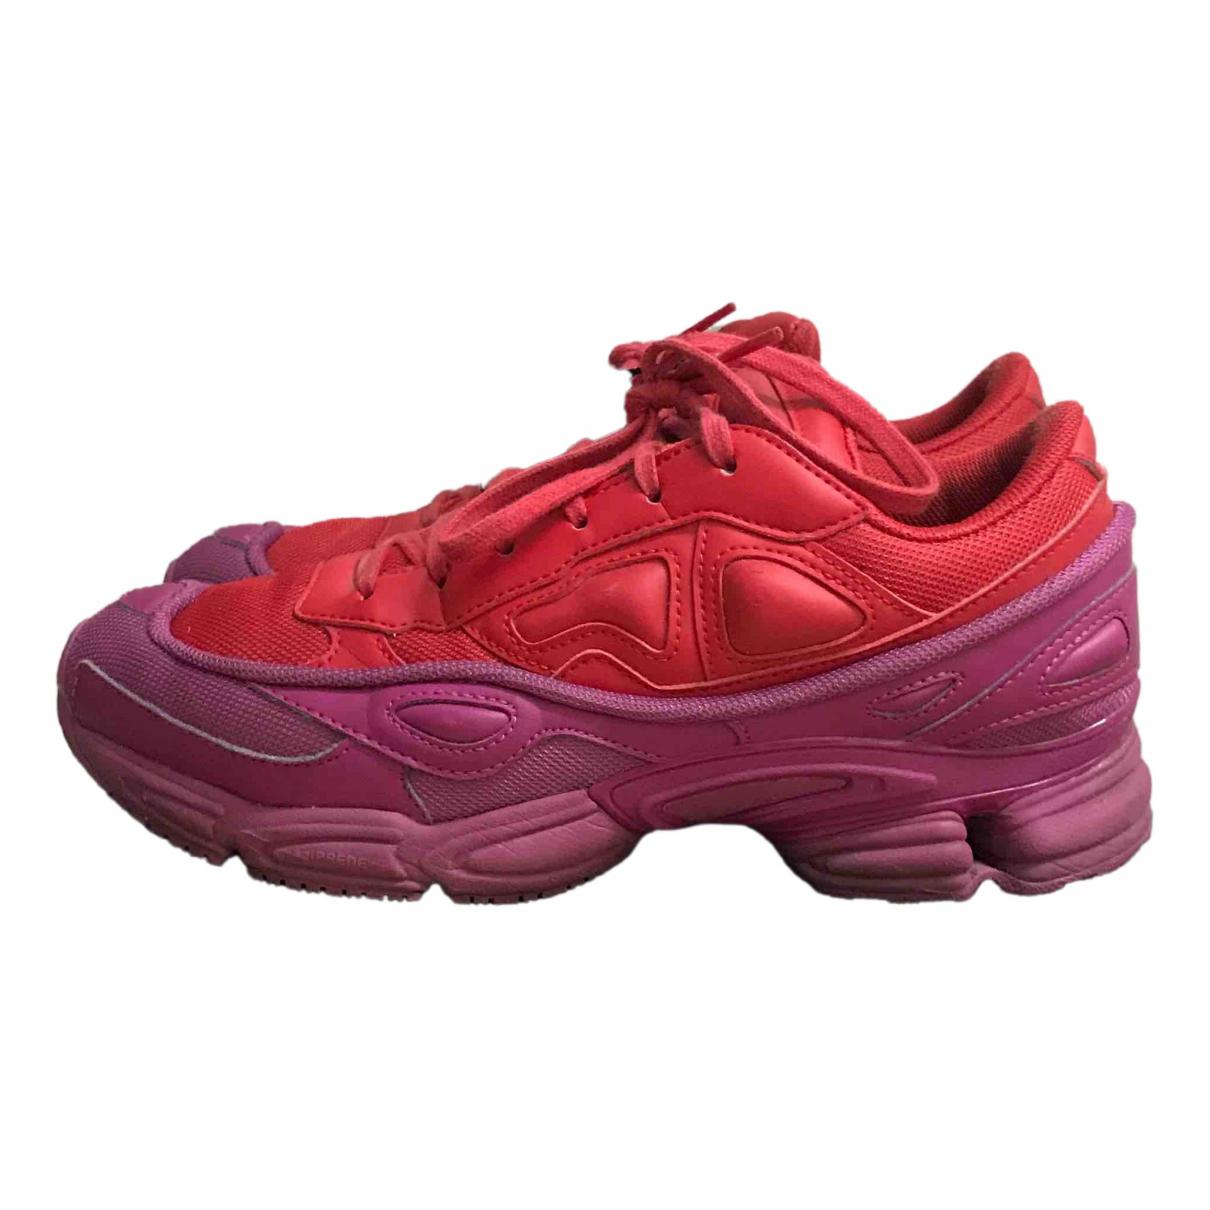 Adidas x Raf Simons Ozweego 2 leather low trainers